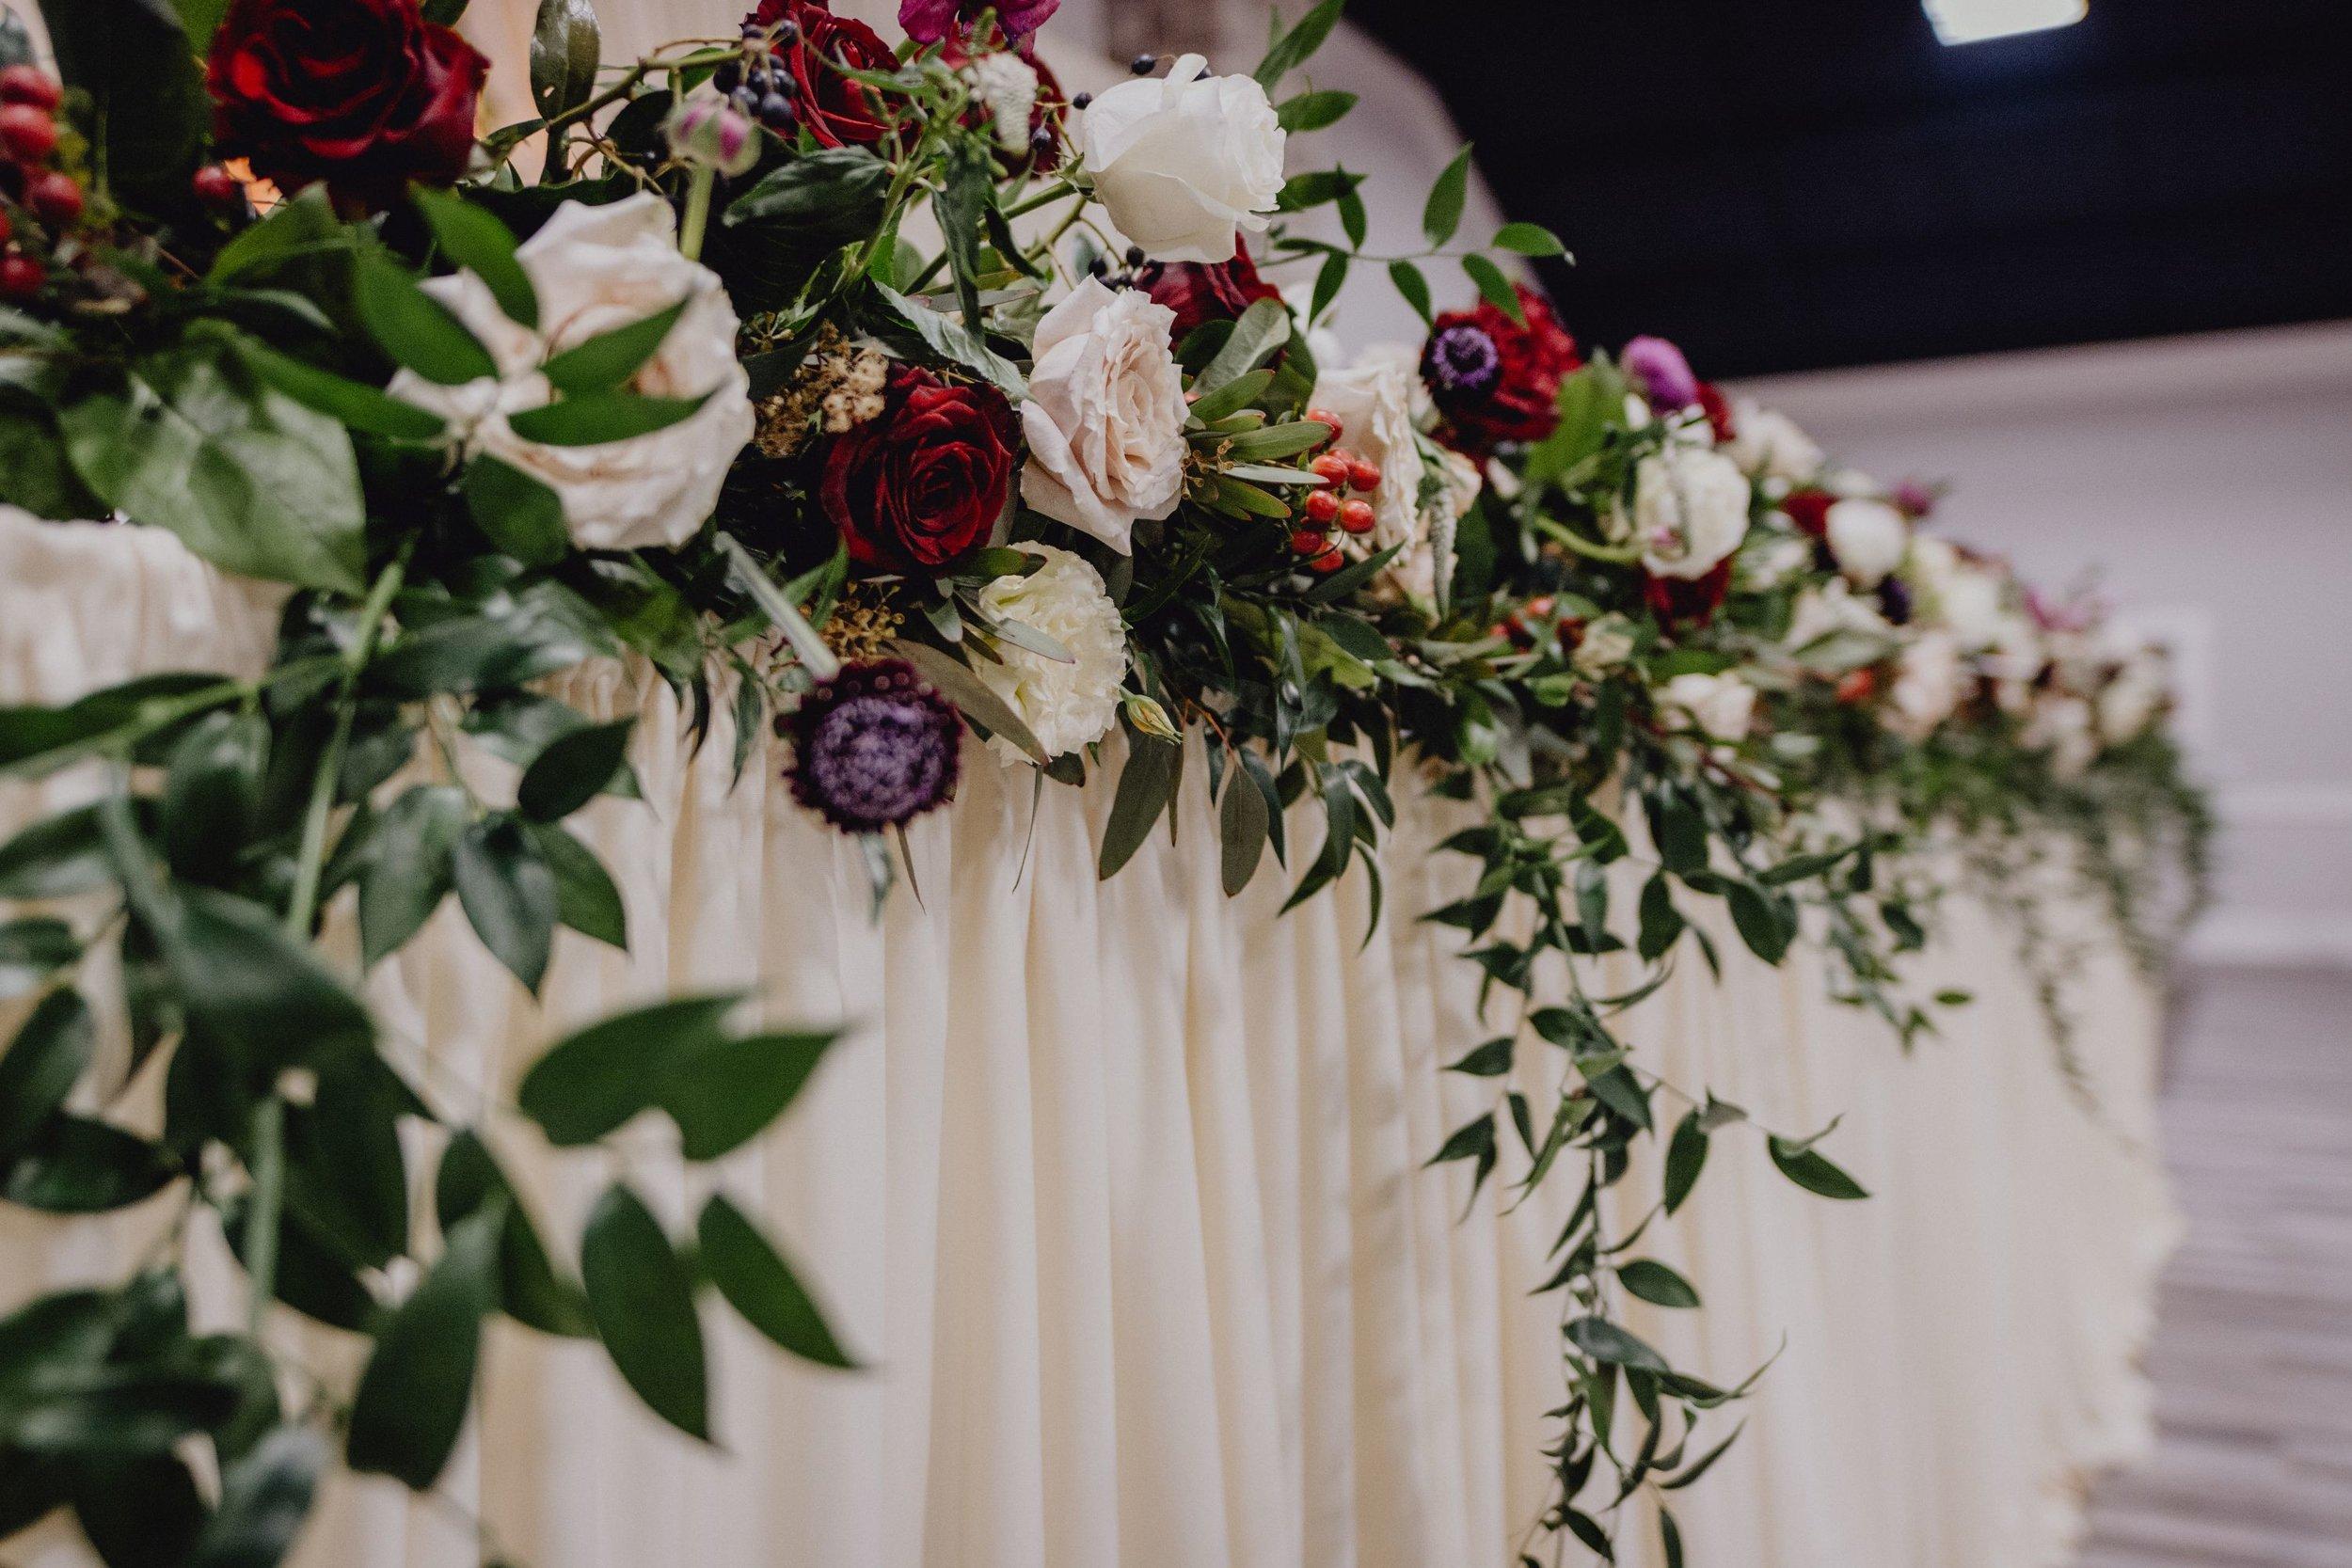 North-Dallas-Wedding-Florist-David-Co.-23.jpg